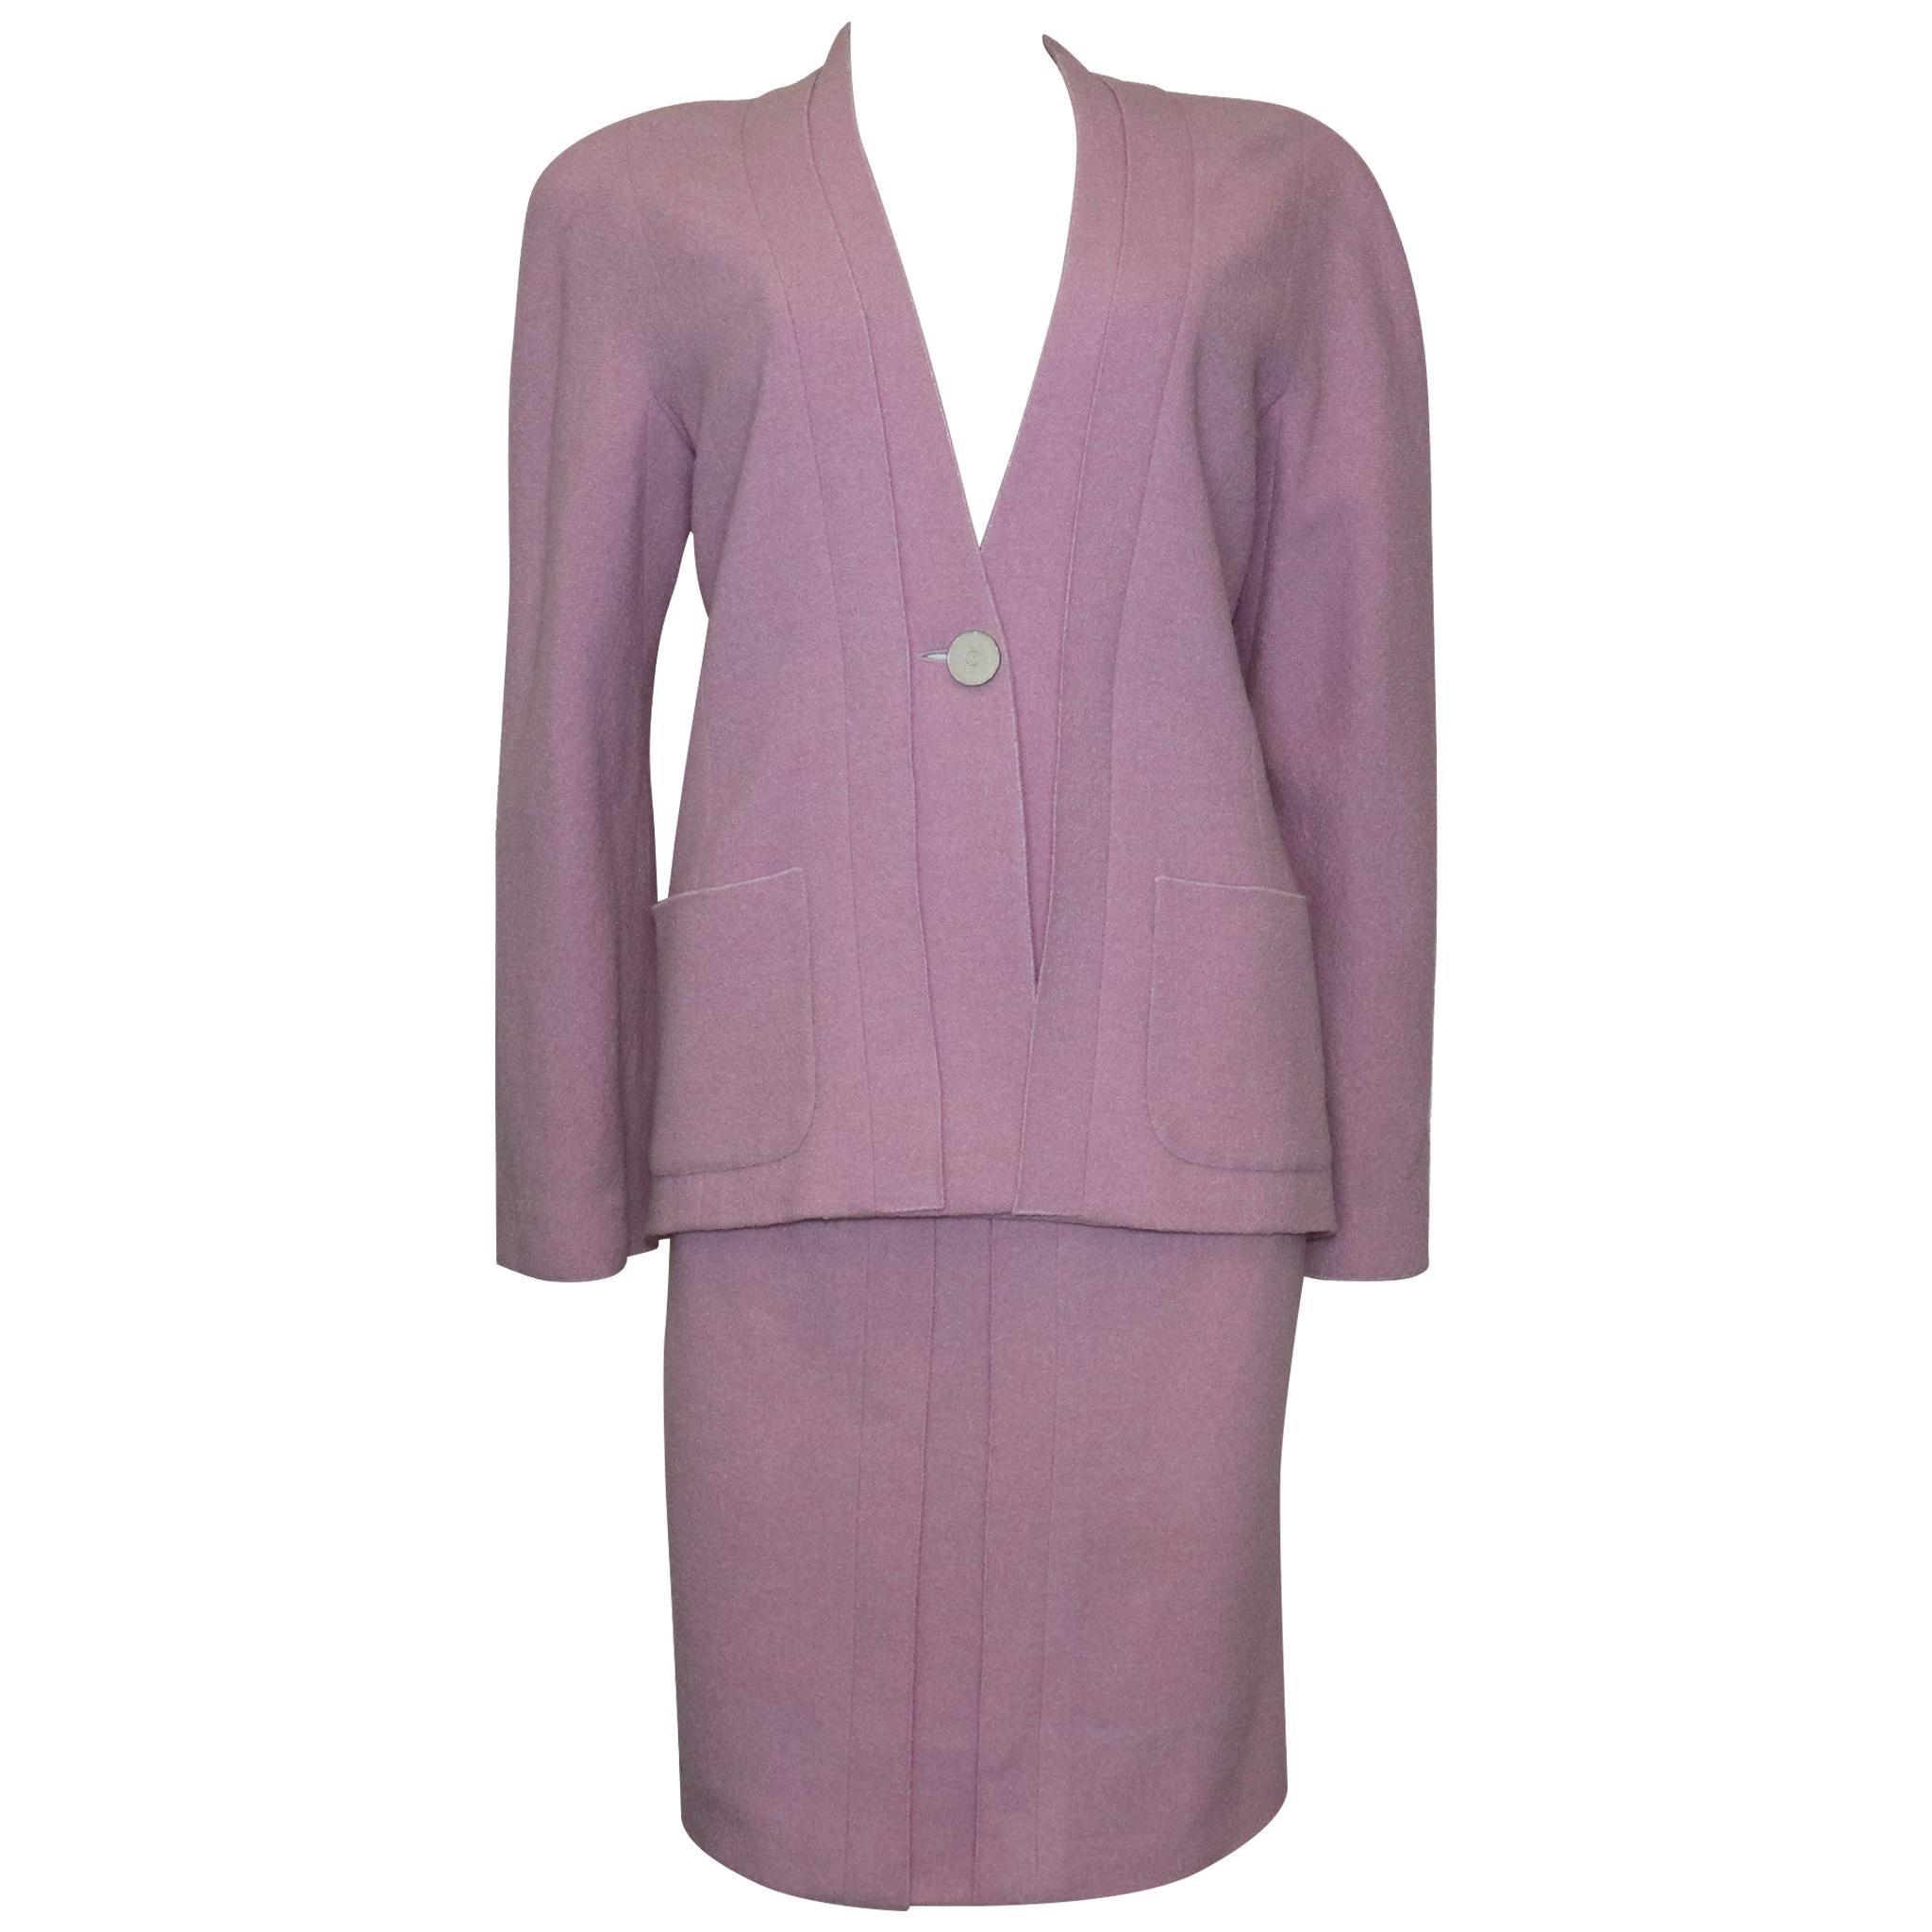 Chanel Lavender Wool Jacket & Skirt Set Circa 1990s